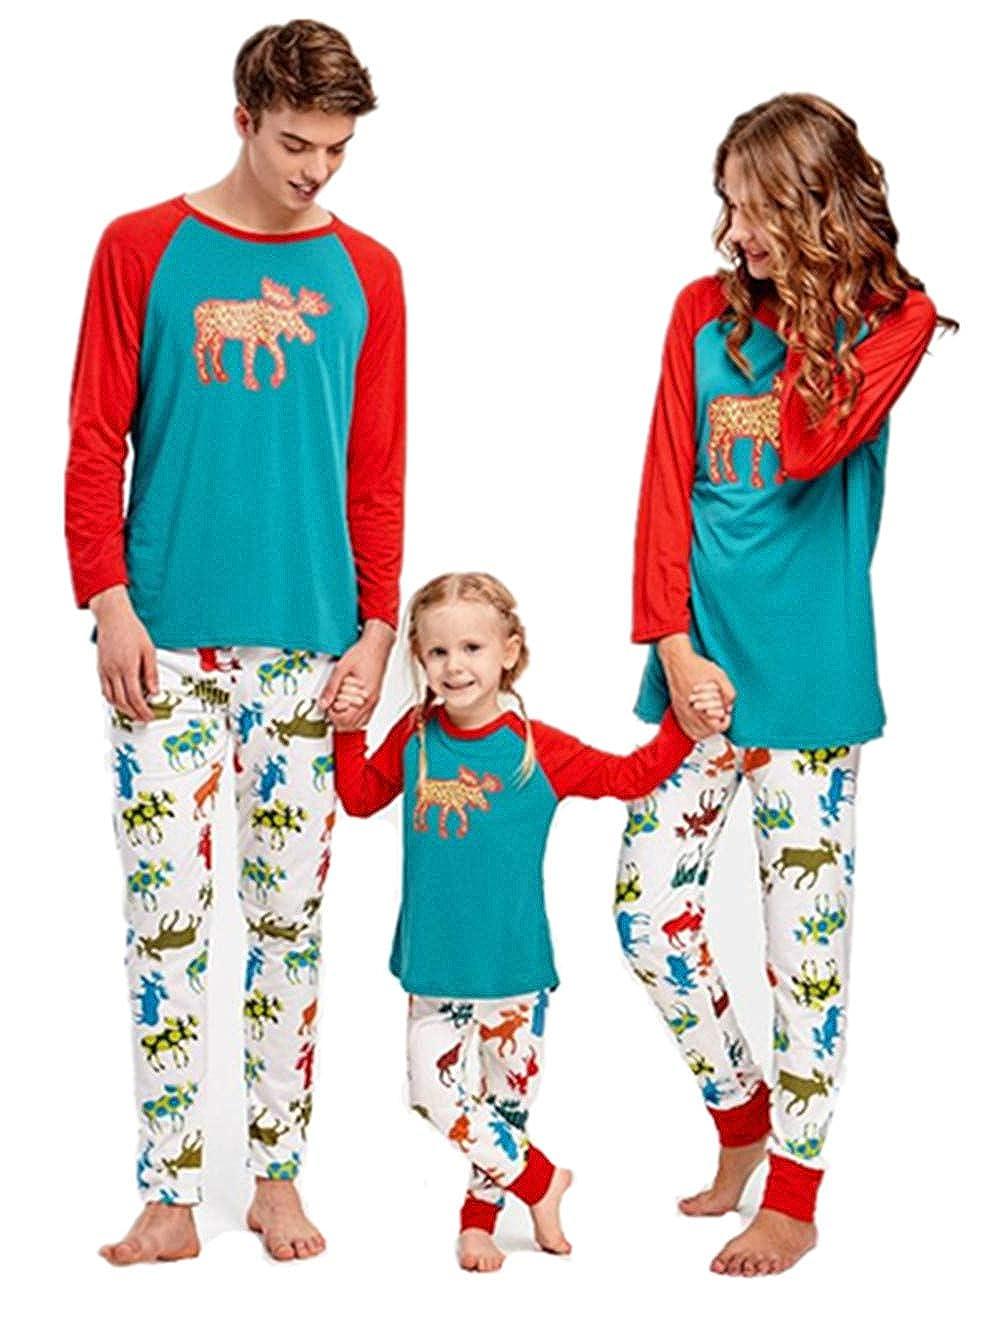 Happyjiu Christmas Elk Family Matching Pajamas Set Holiday Sleepwear Sets